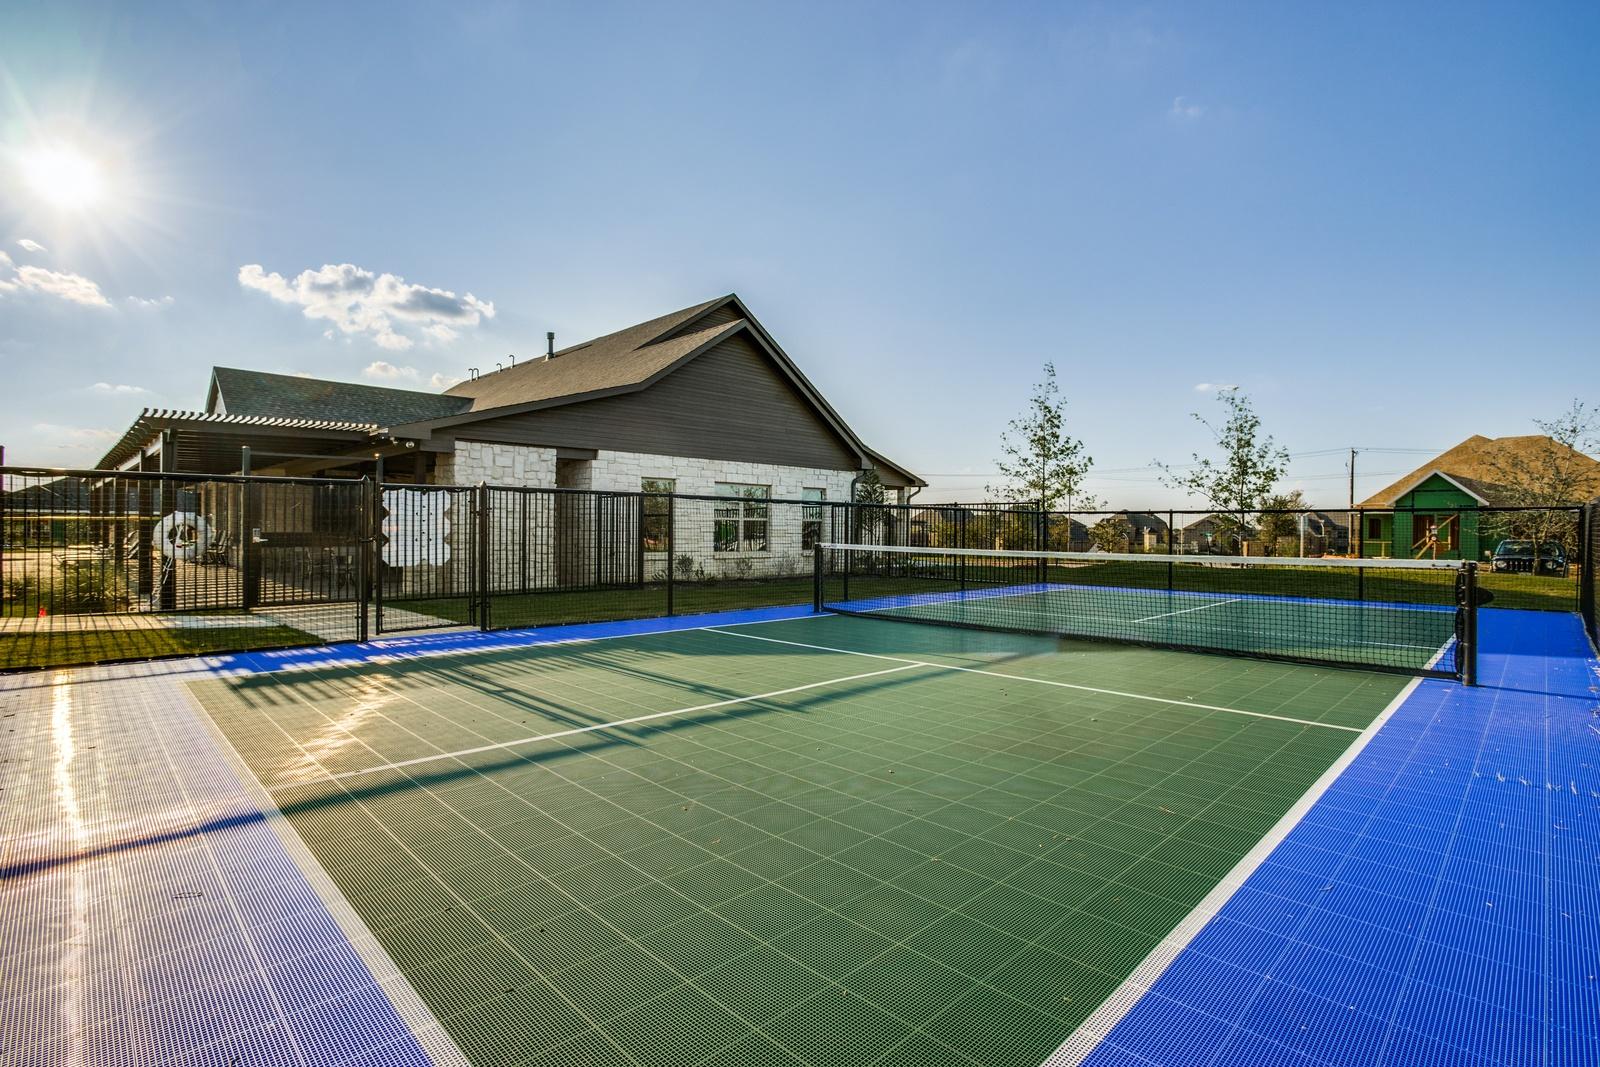 a-large-tennis-court-with-interlocking-green-flooring